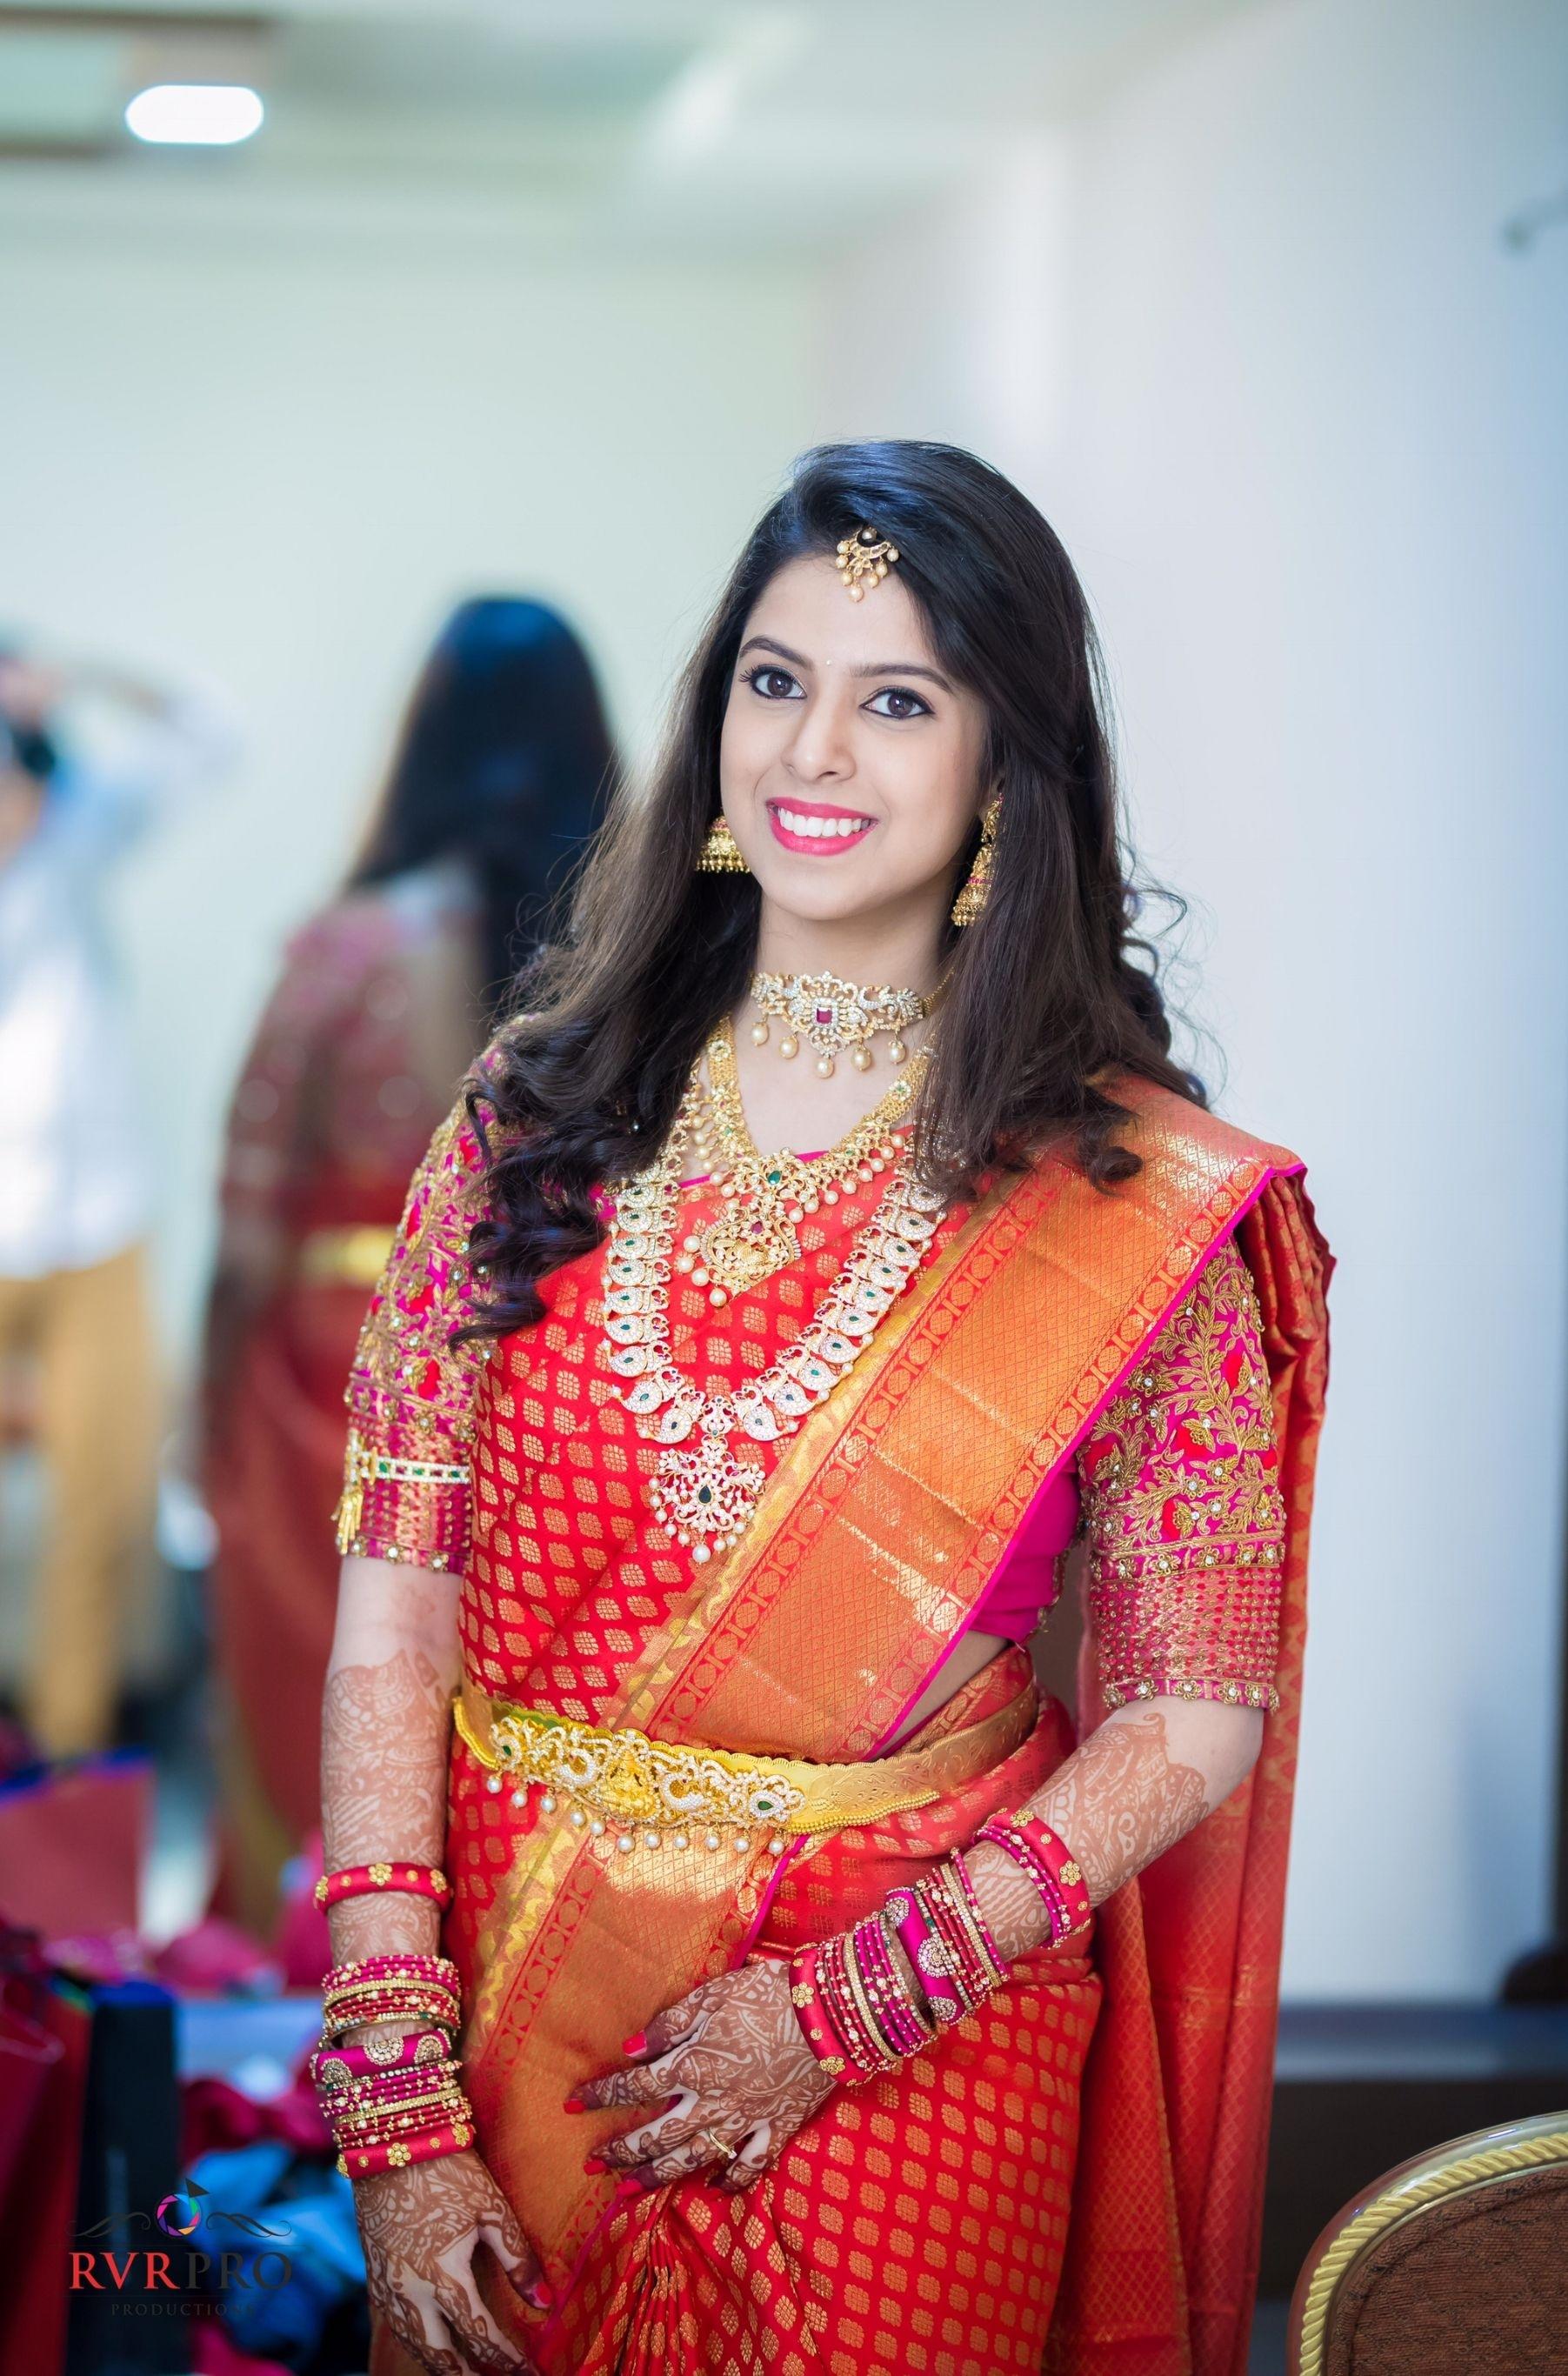 Hairstyle | Hairstyle | Bridal Silk Saree, Indian Wedding intended for Hairstyles For Indian Wedding On Saree